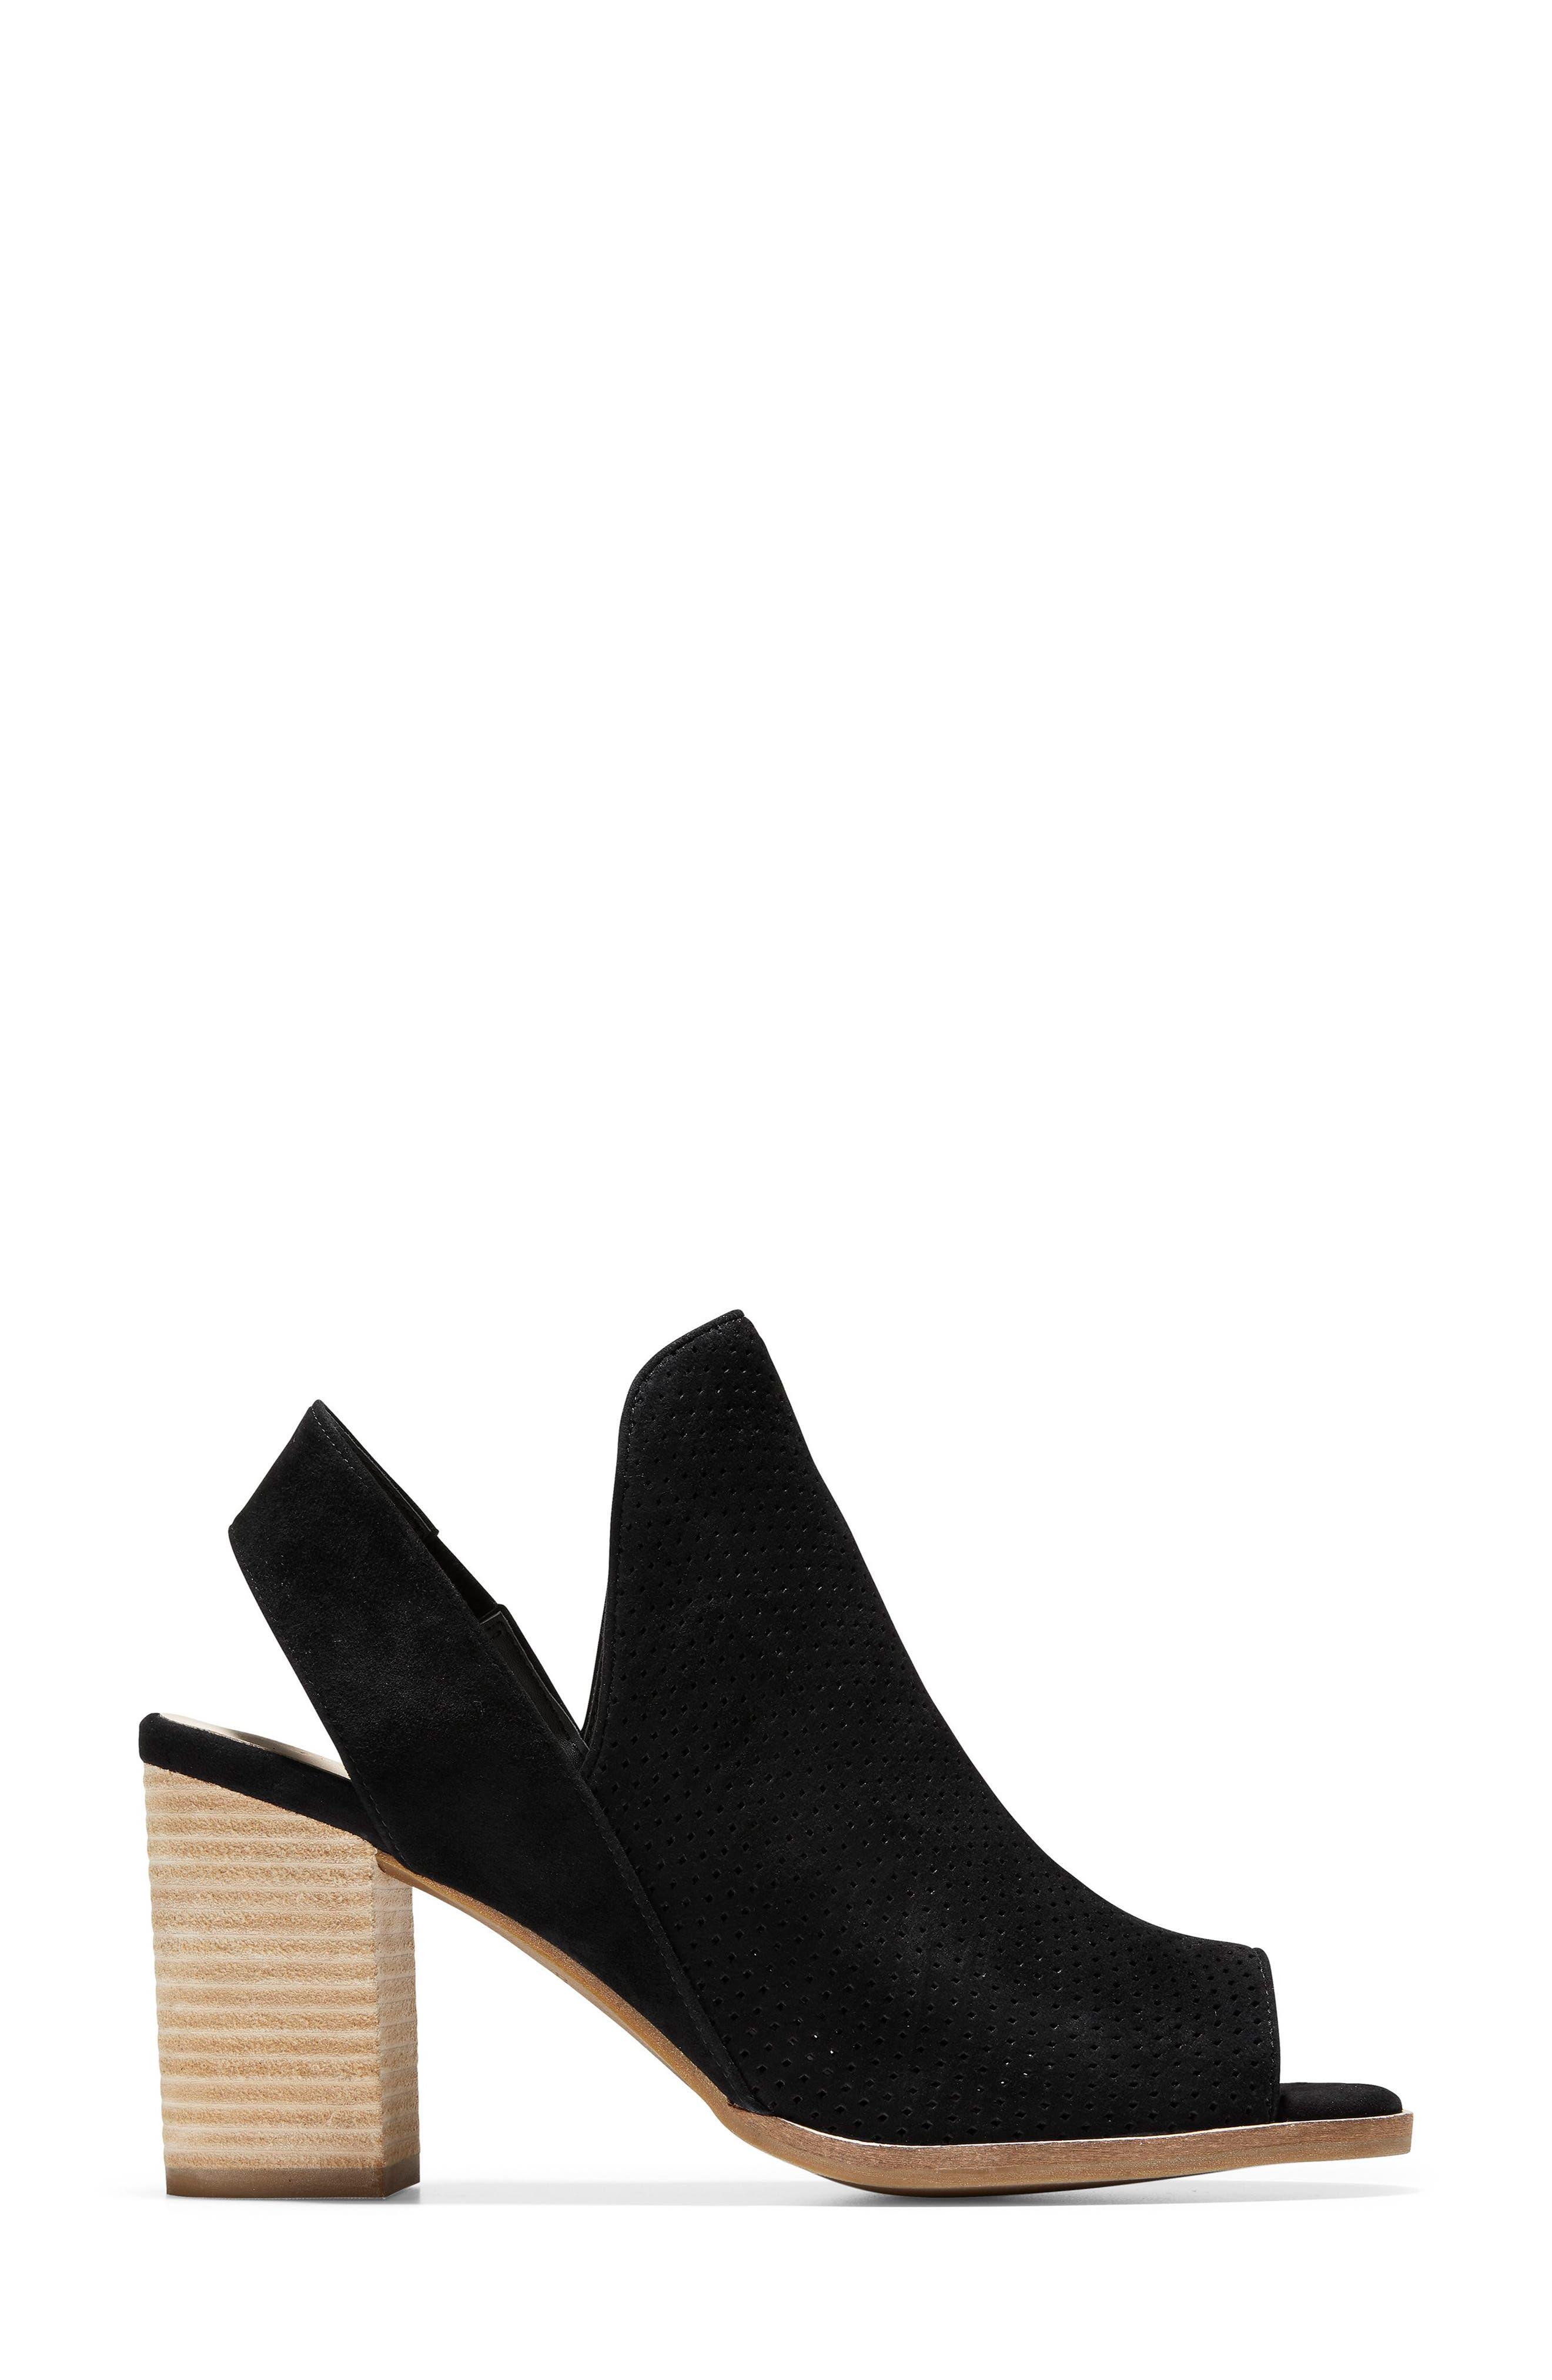 Callista Perforated Slingback Sandal,                             Alternate thumbnail 3, color,                             BLACK PERF SUEDE